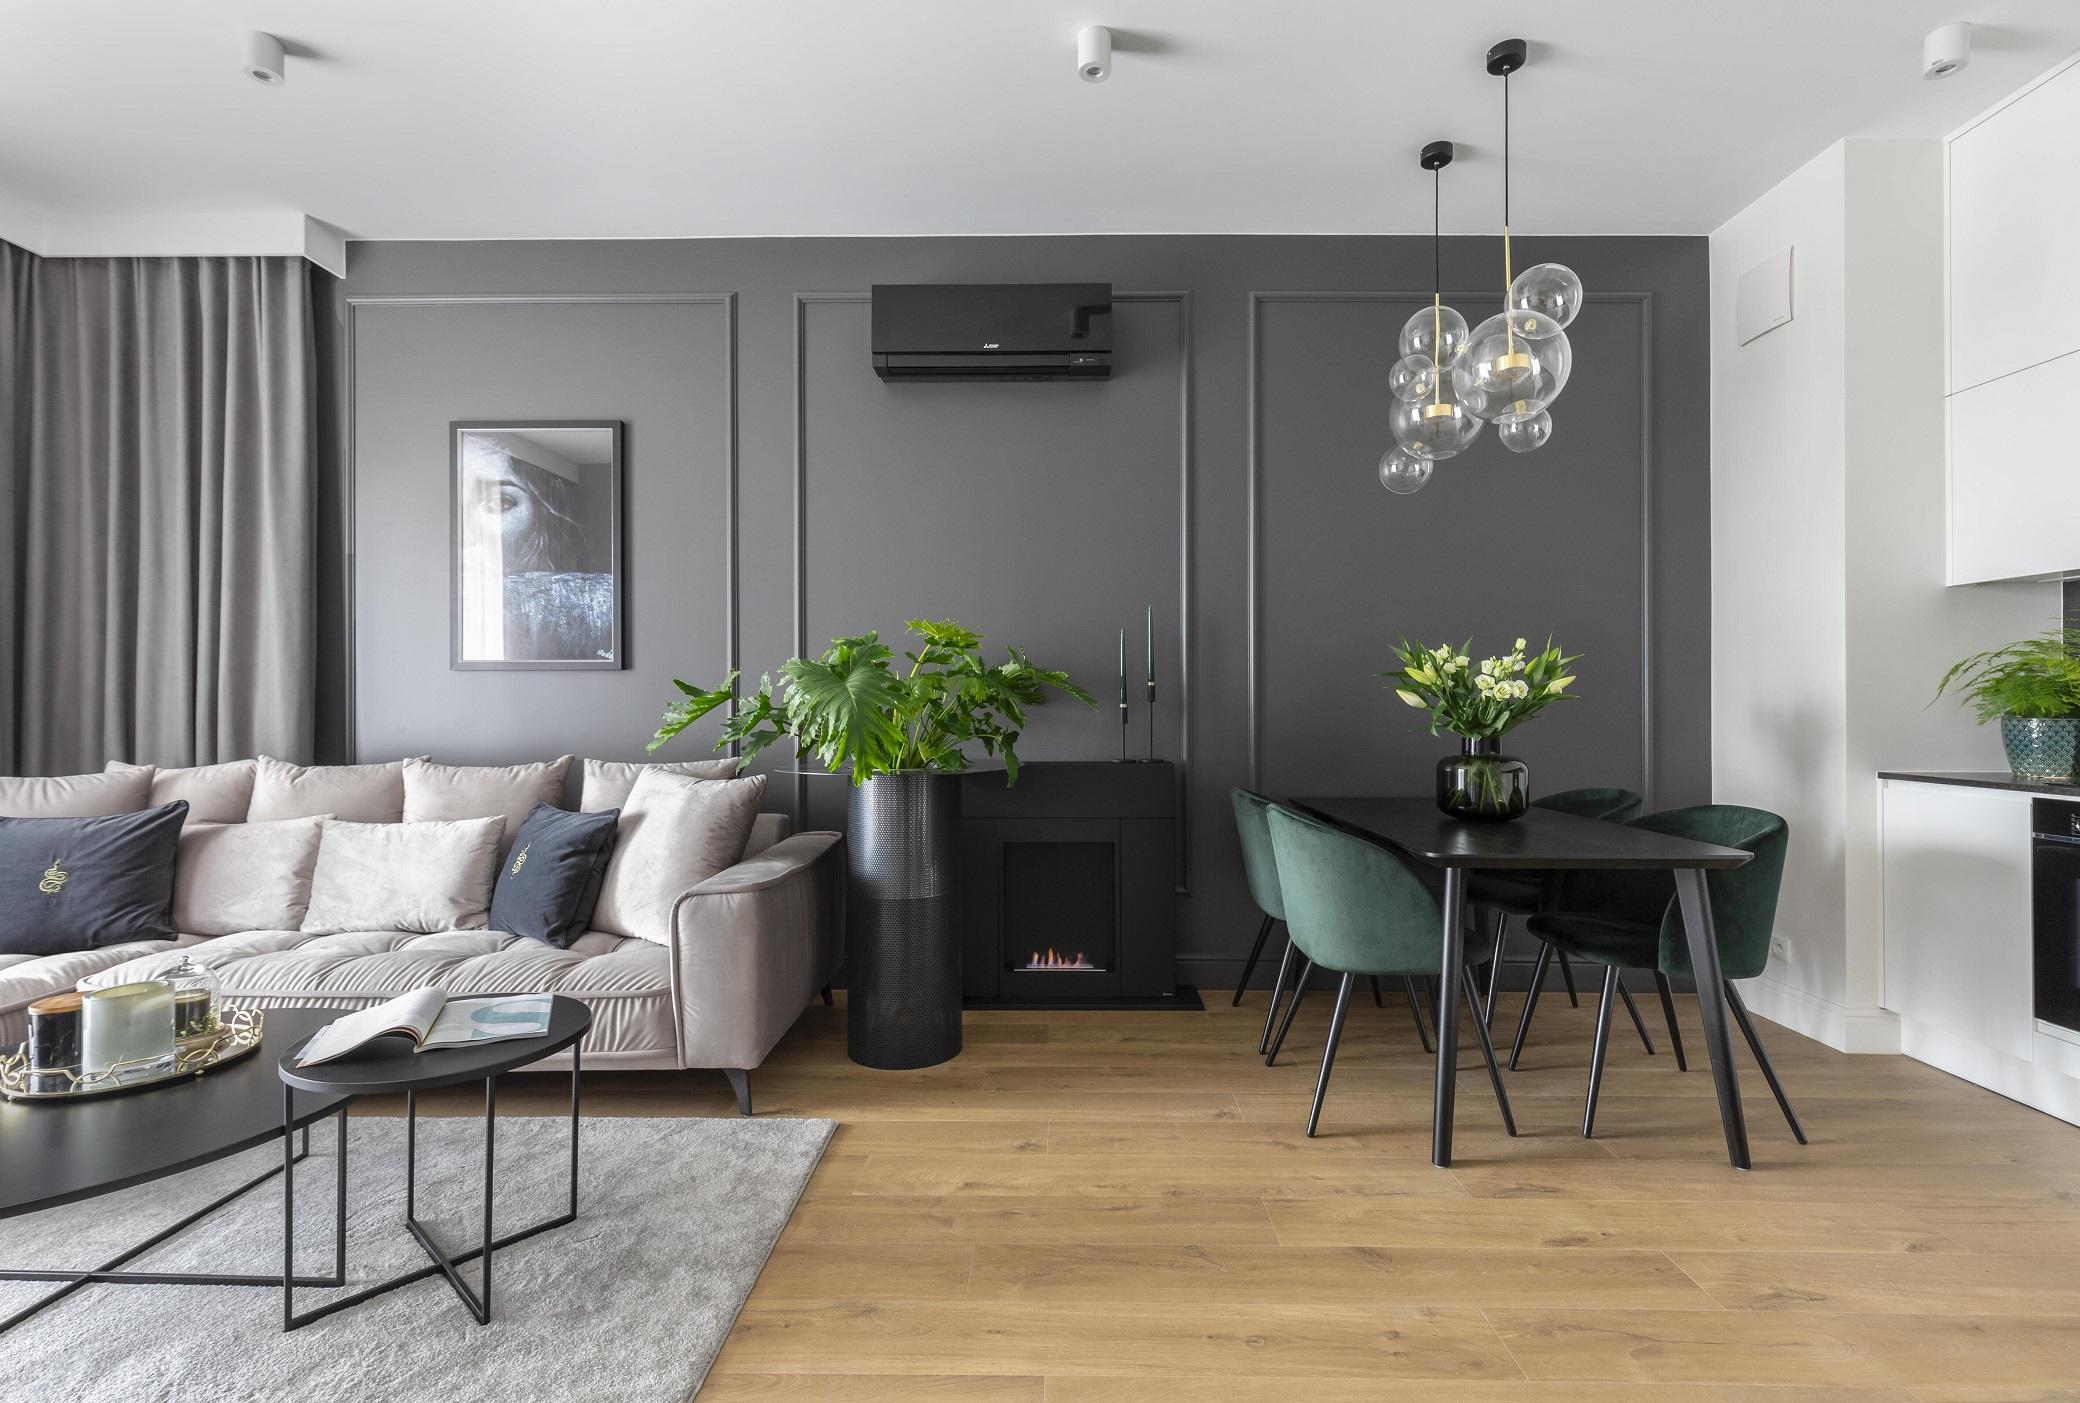 naboo_ciemne-mieszkanie